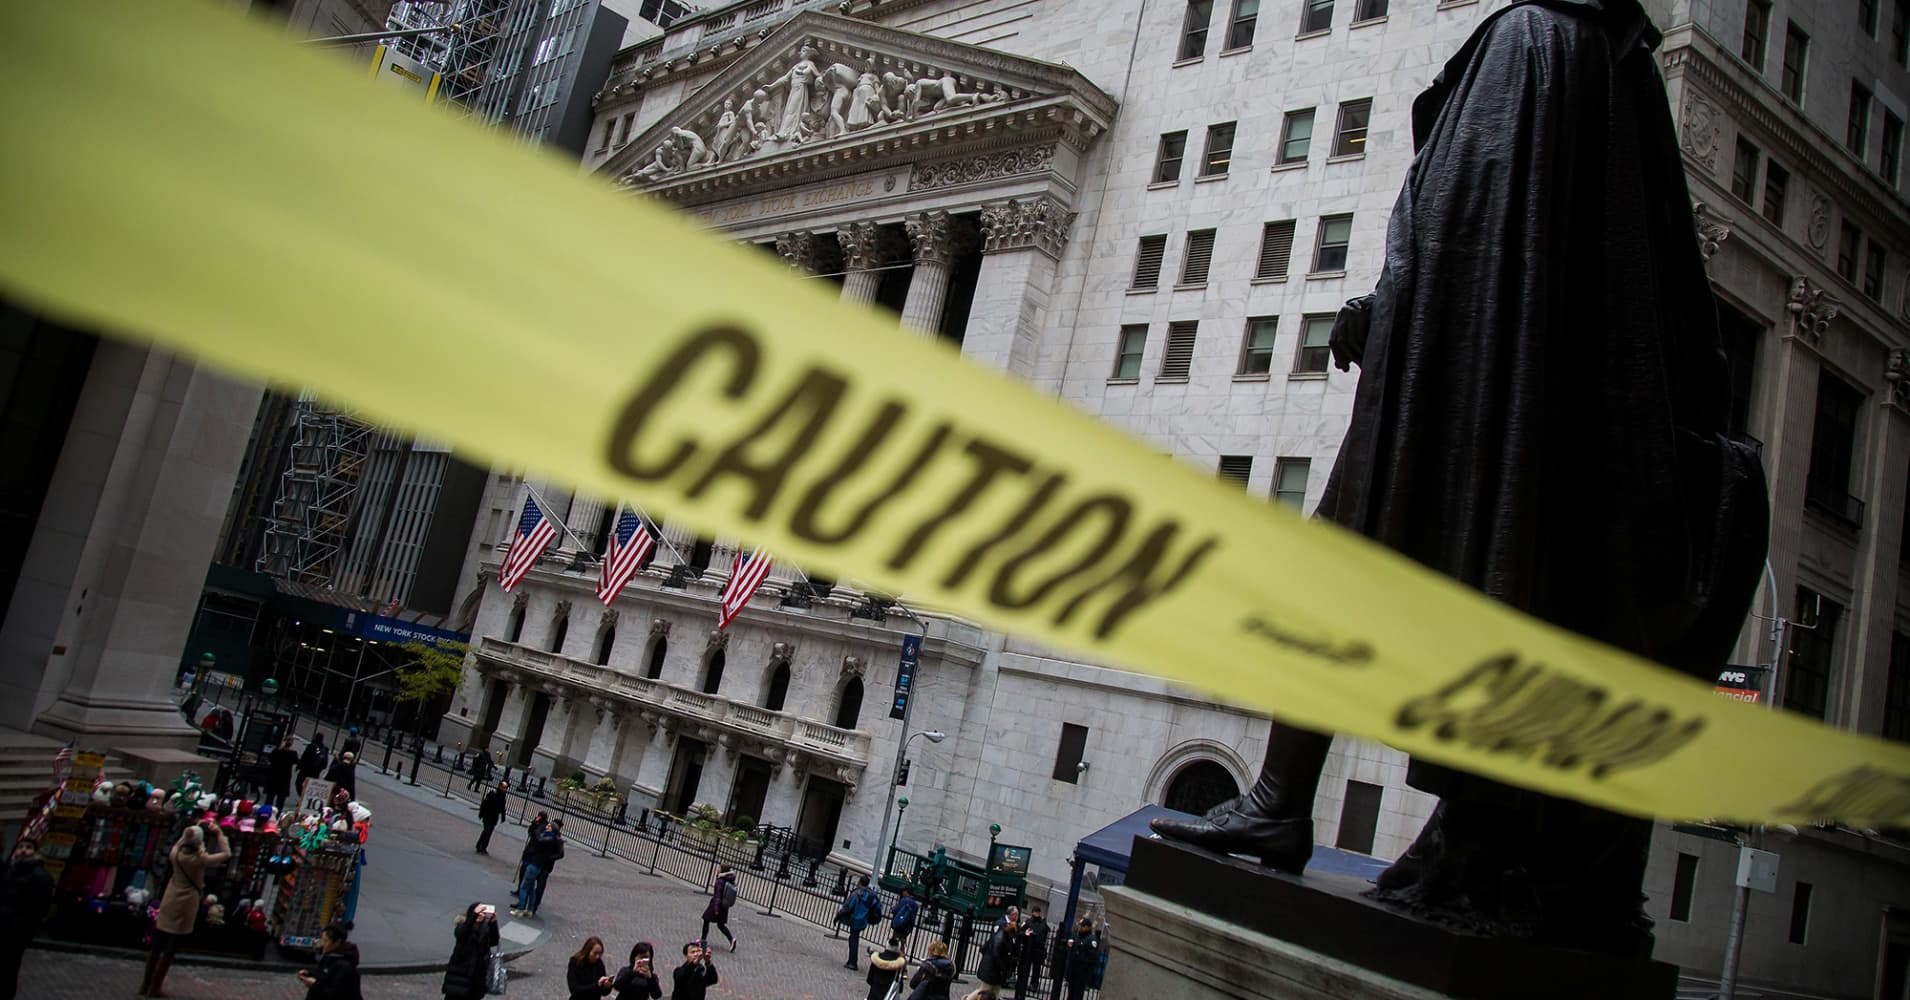 It's too early to turn bullish on stocks, Louise Yamada warns